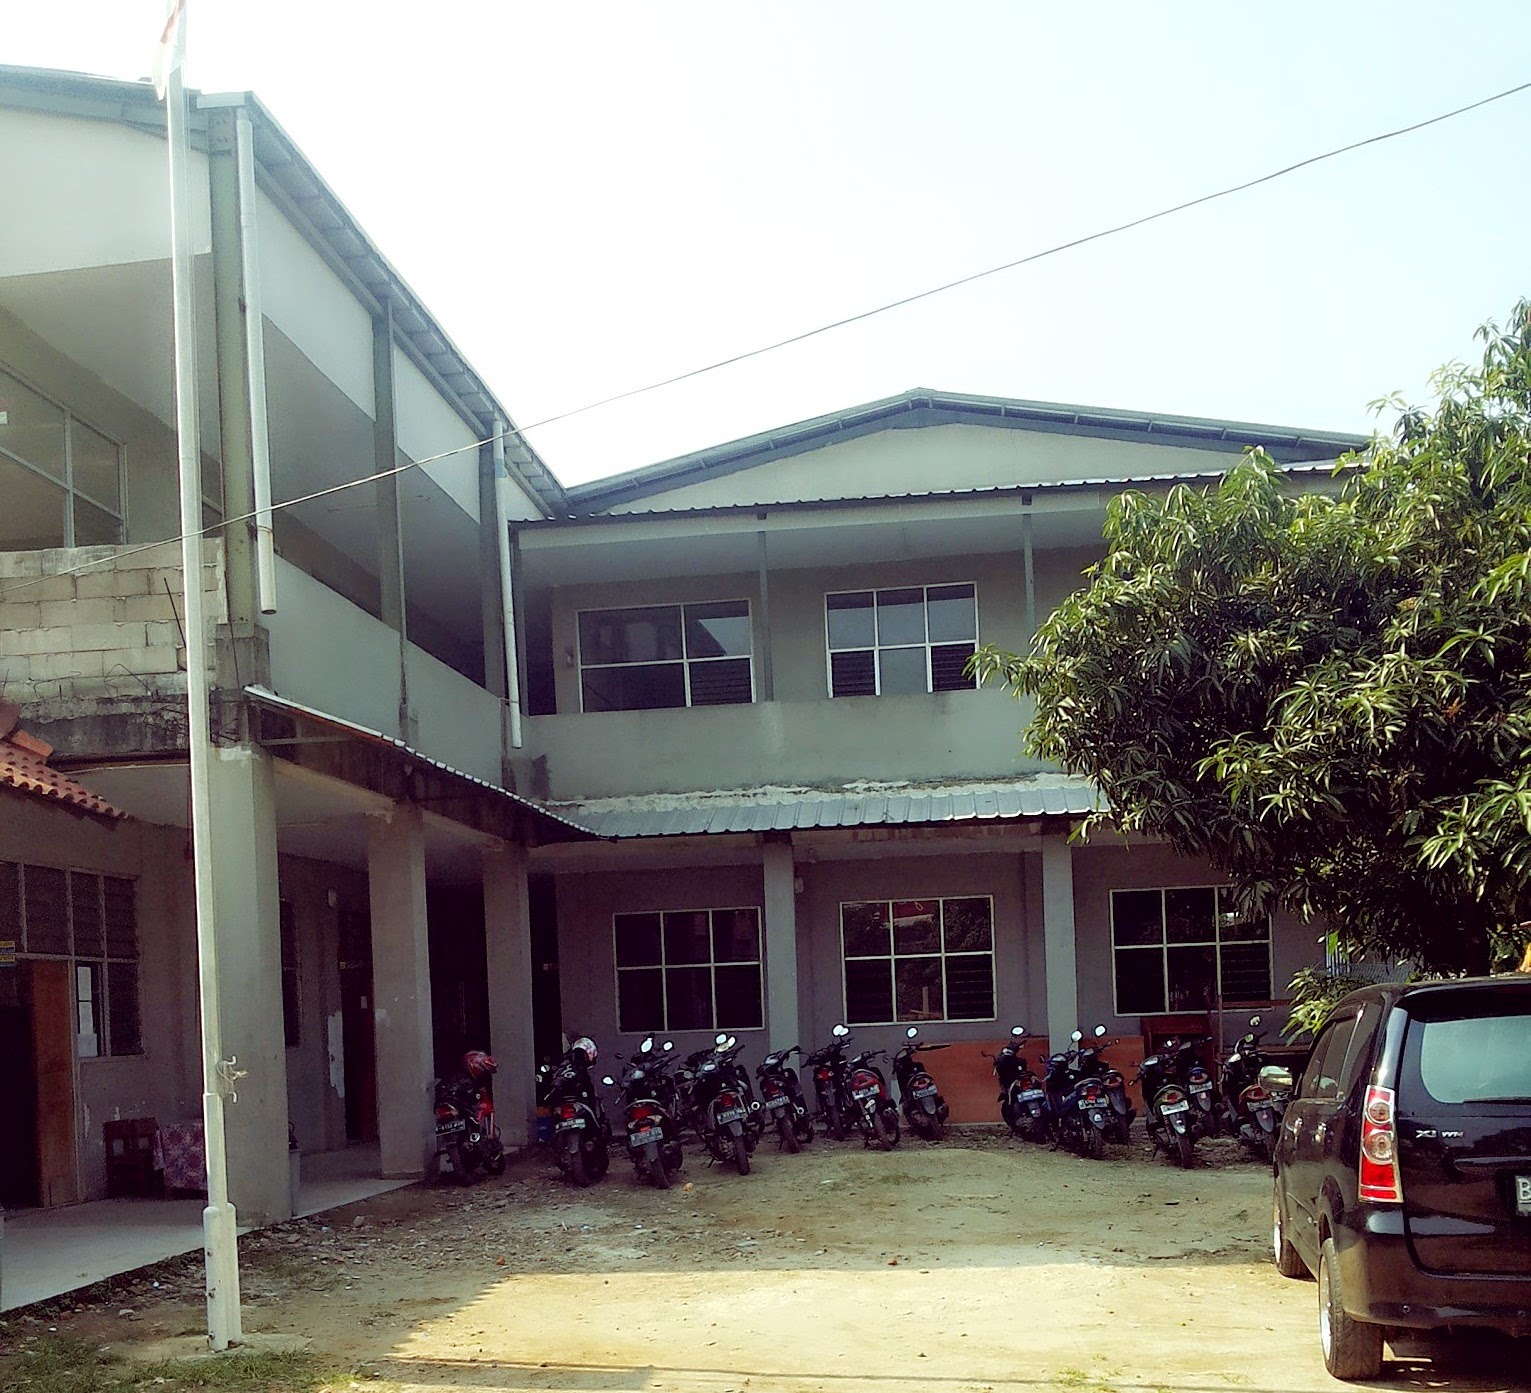 GEDUNG SMK 1 CAITRA ADHI PRATAMA - JAKARTA :